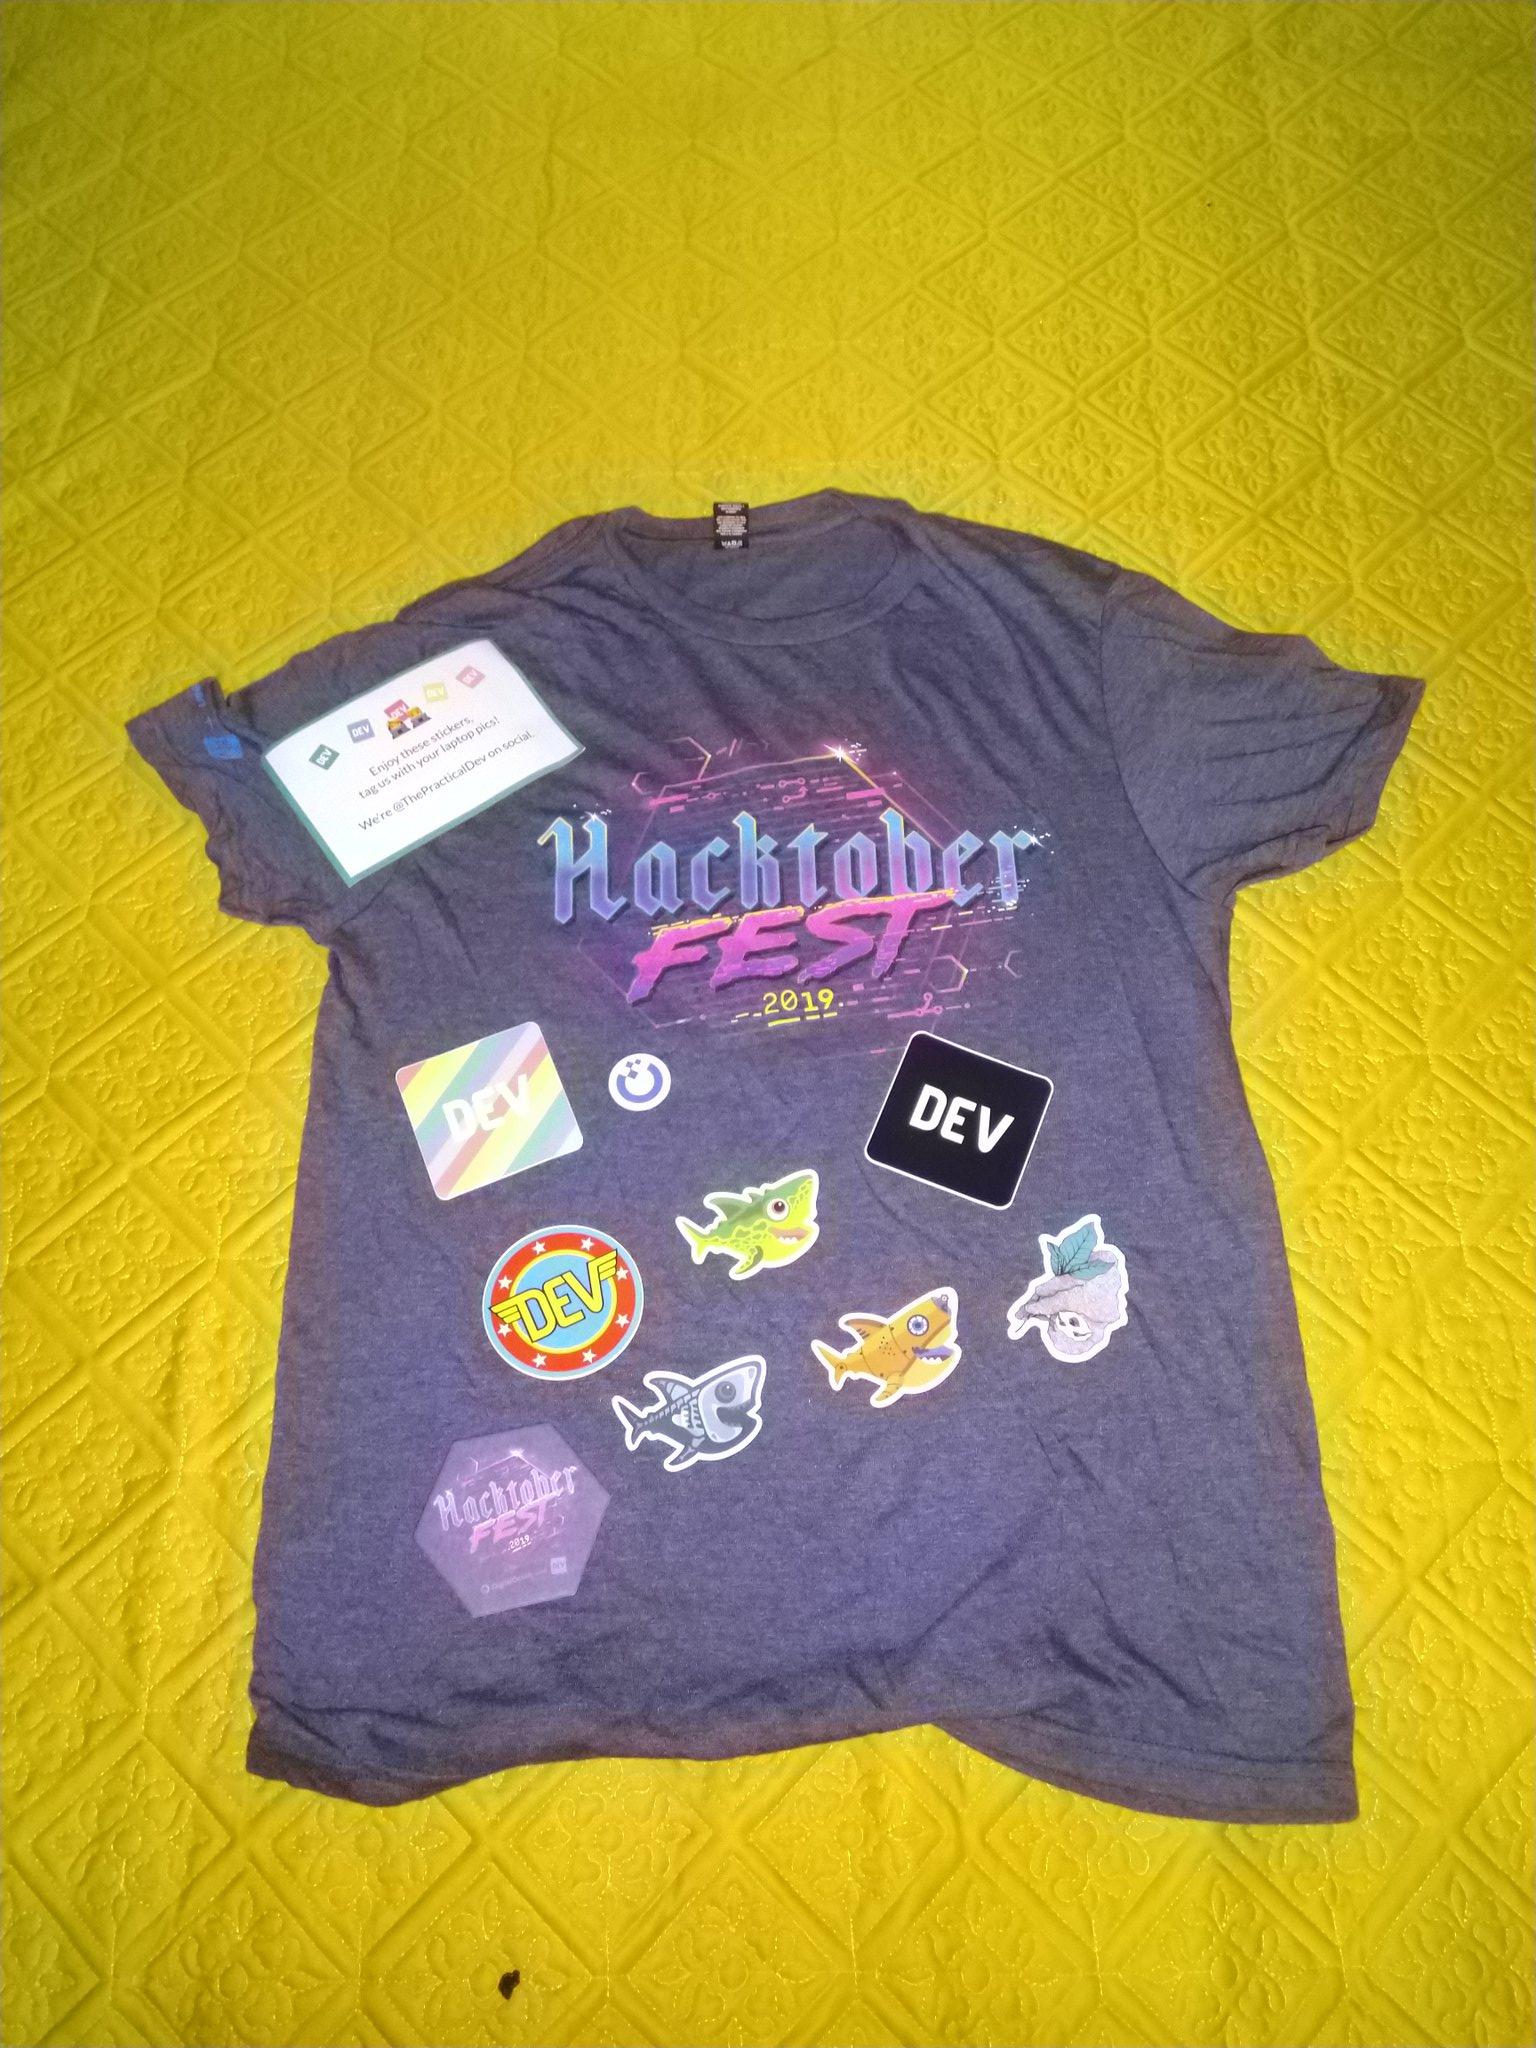 hacktoberfest-T-shirt-2019